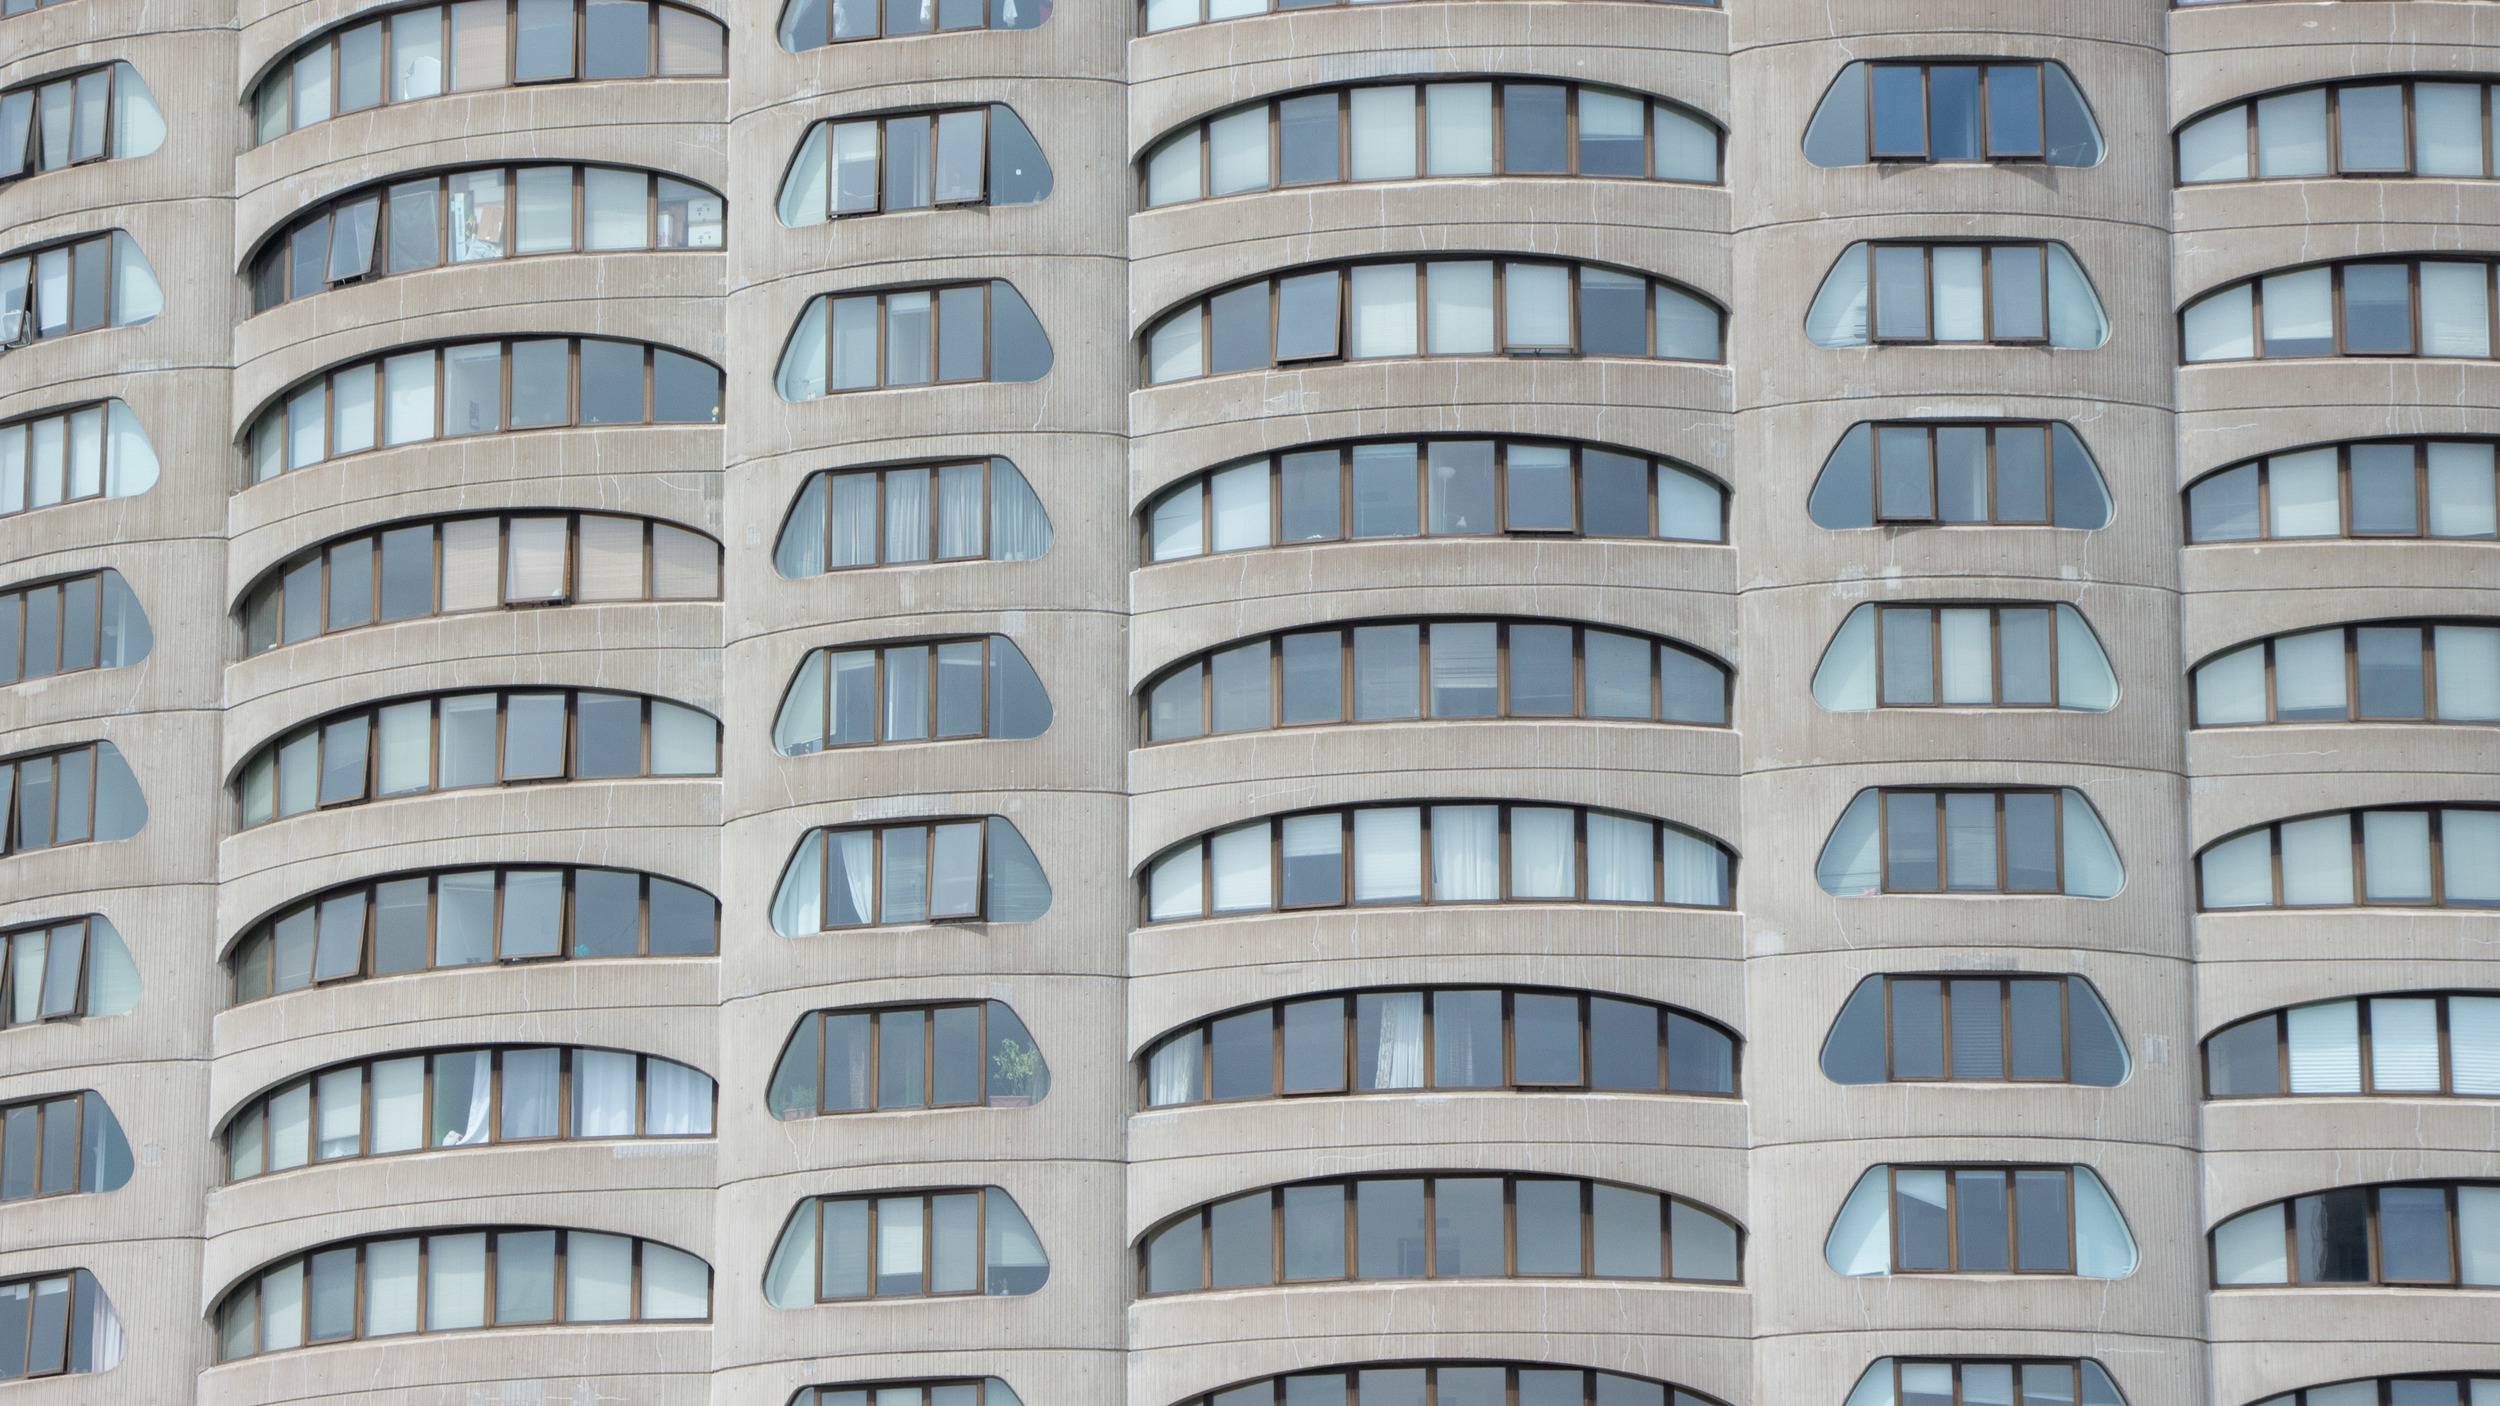 ChicagoArchitecture-1.jpg